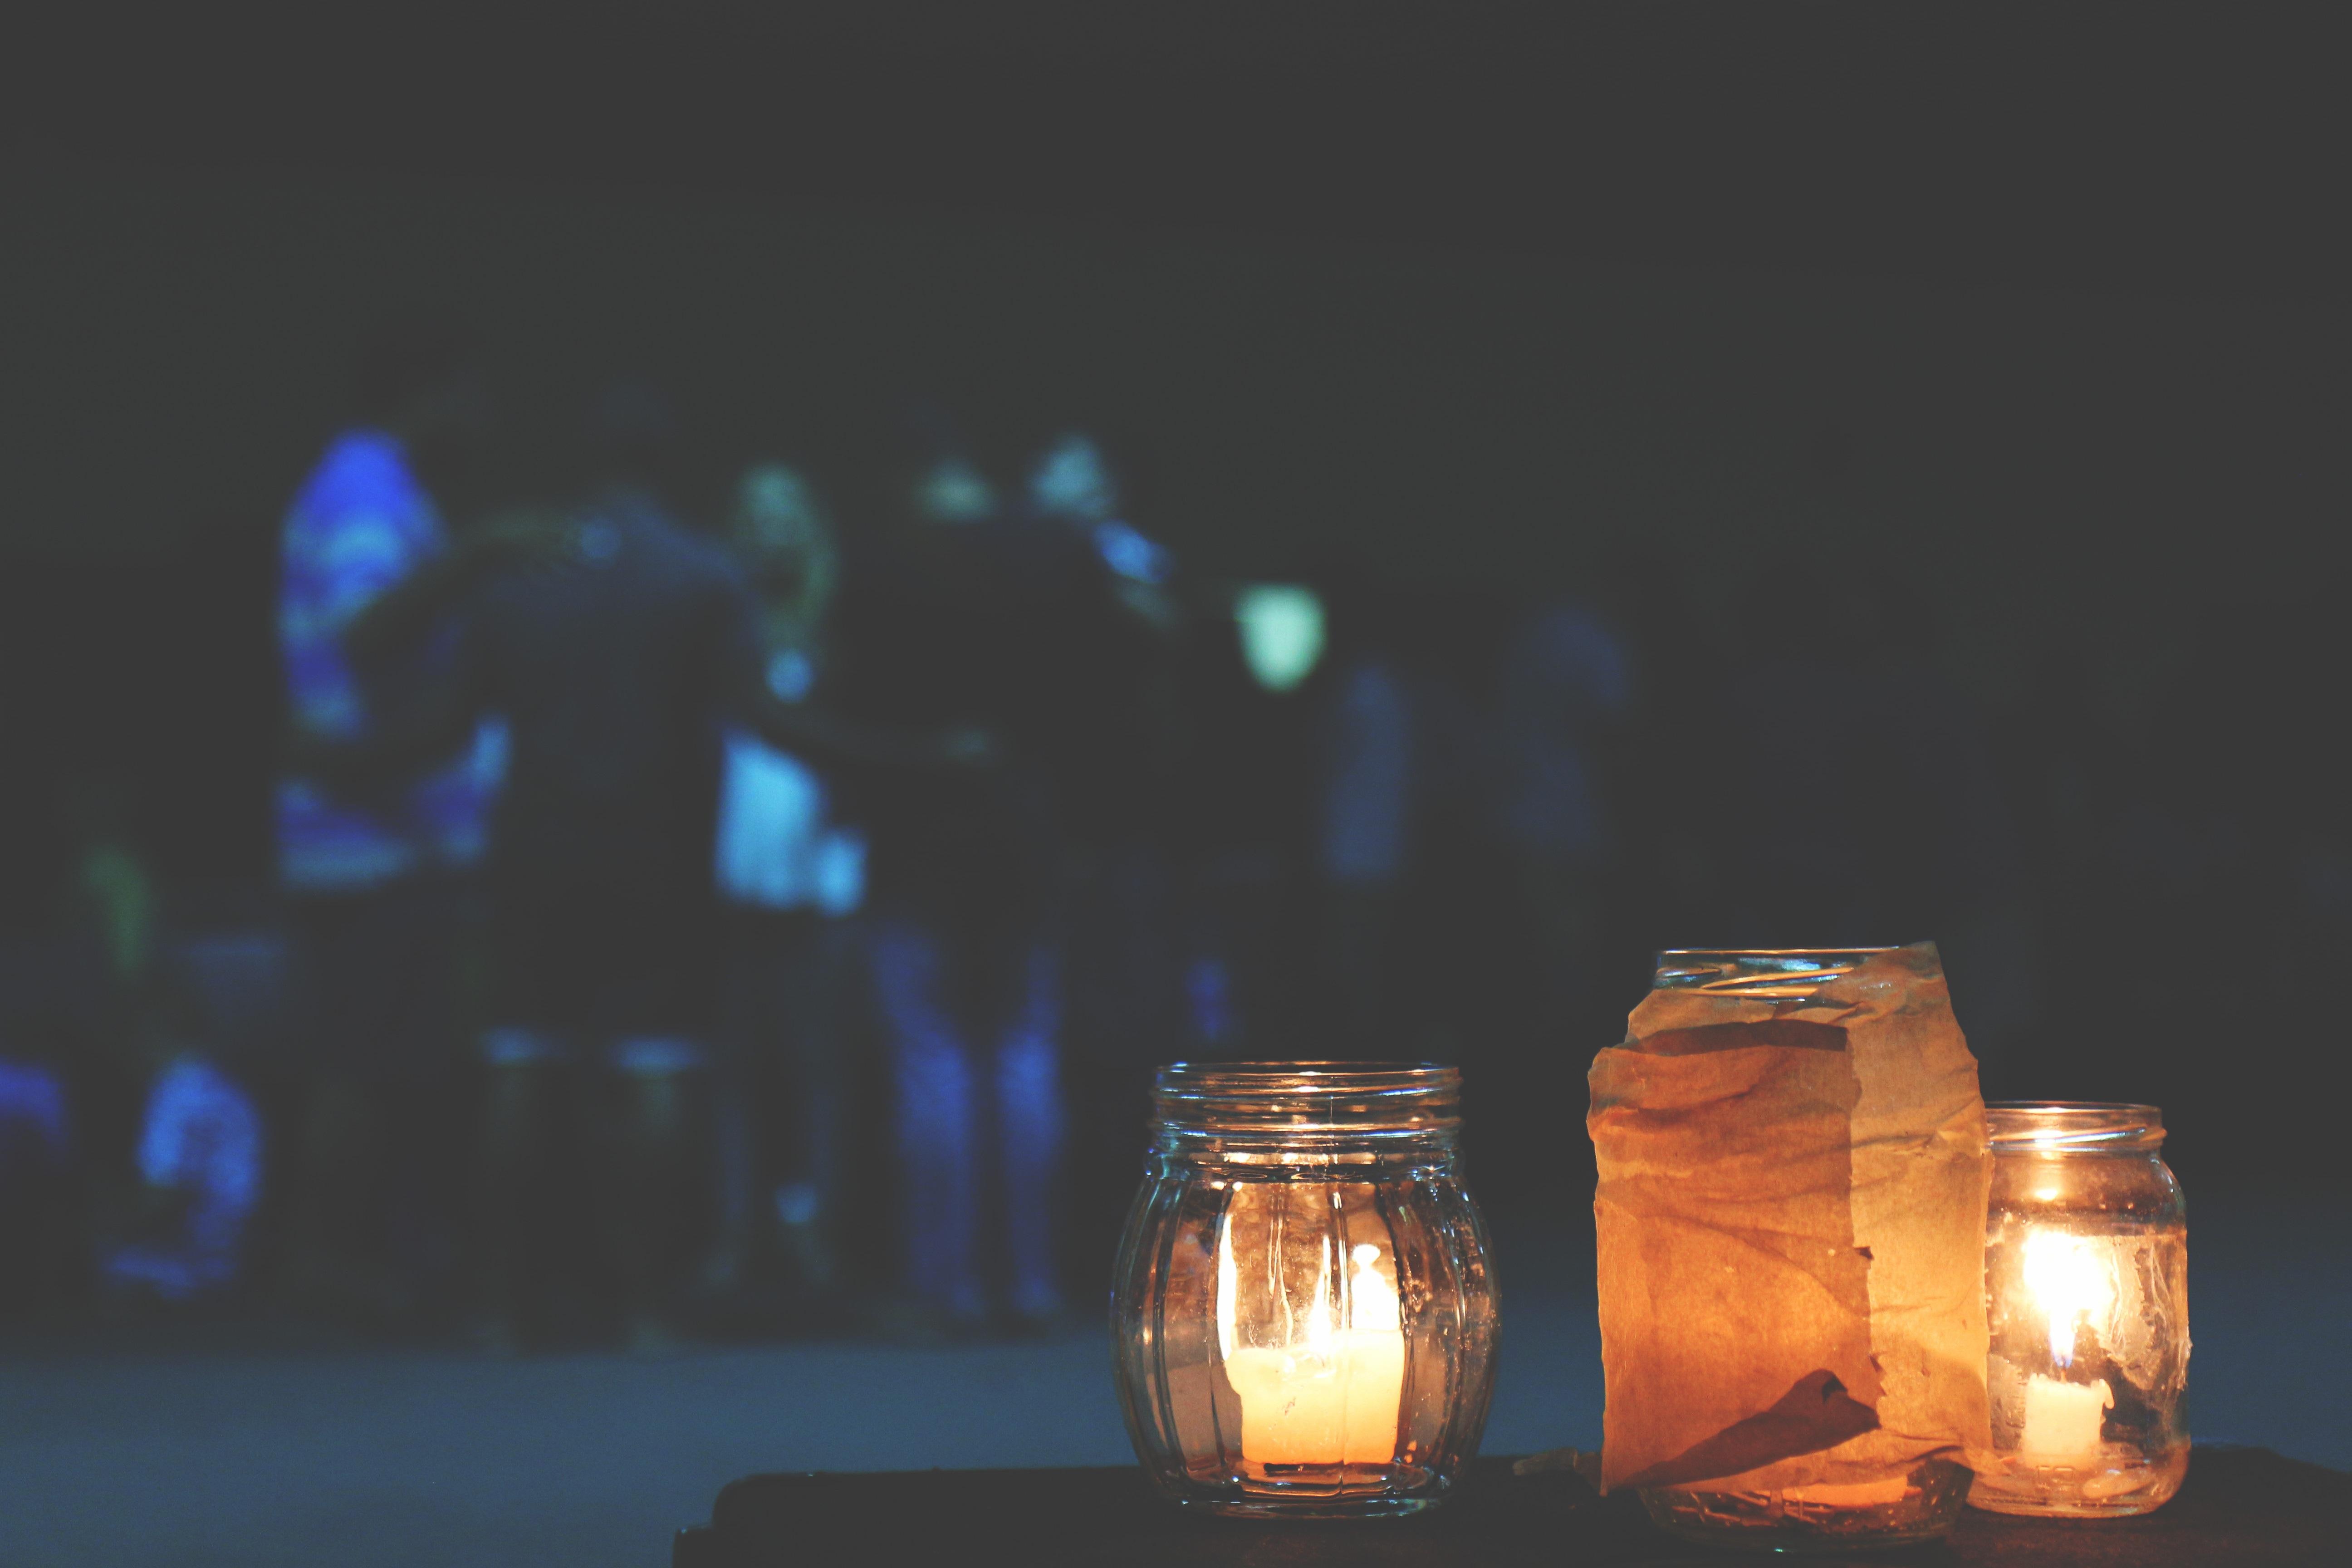 free images light blur group glass dark celebration evening